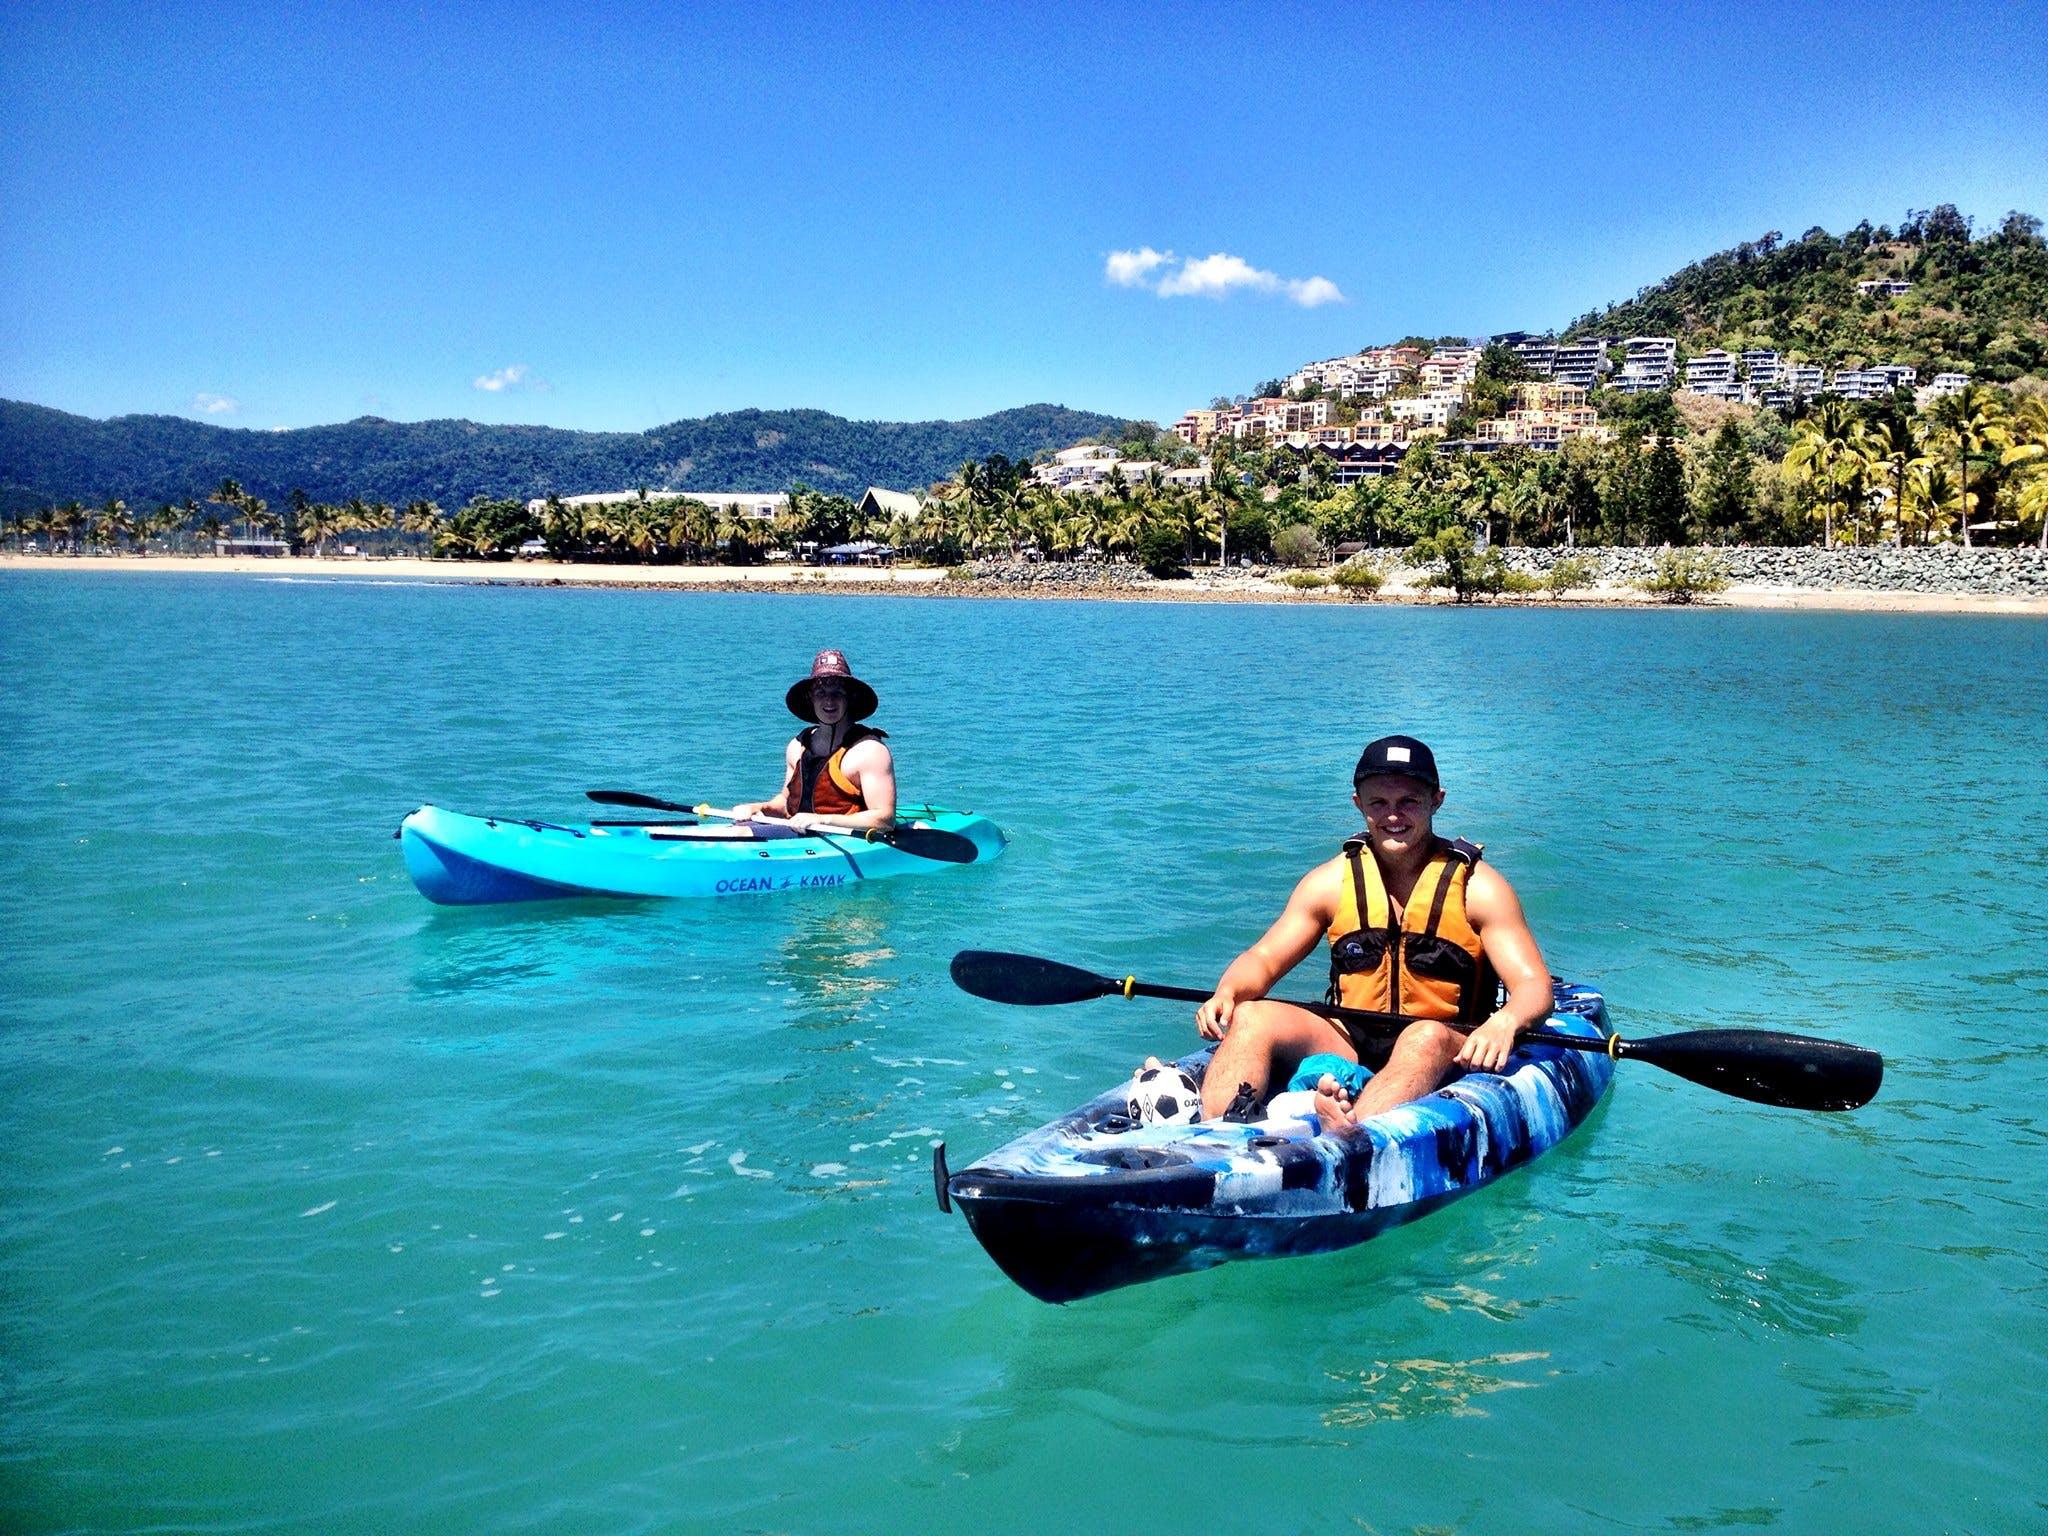 Kayak Hire Whitsunday Stand Up Paddle Board And Kayak